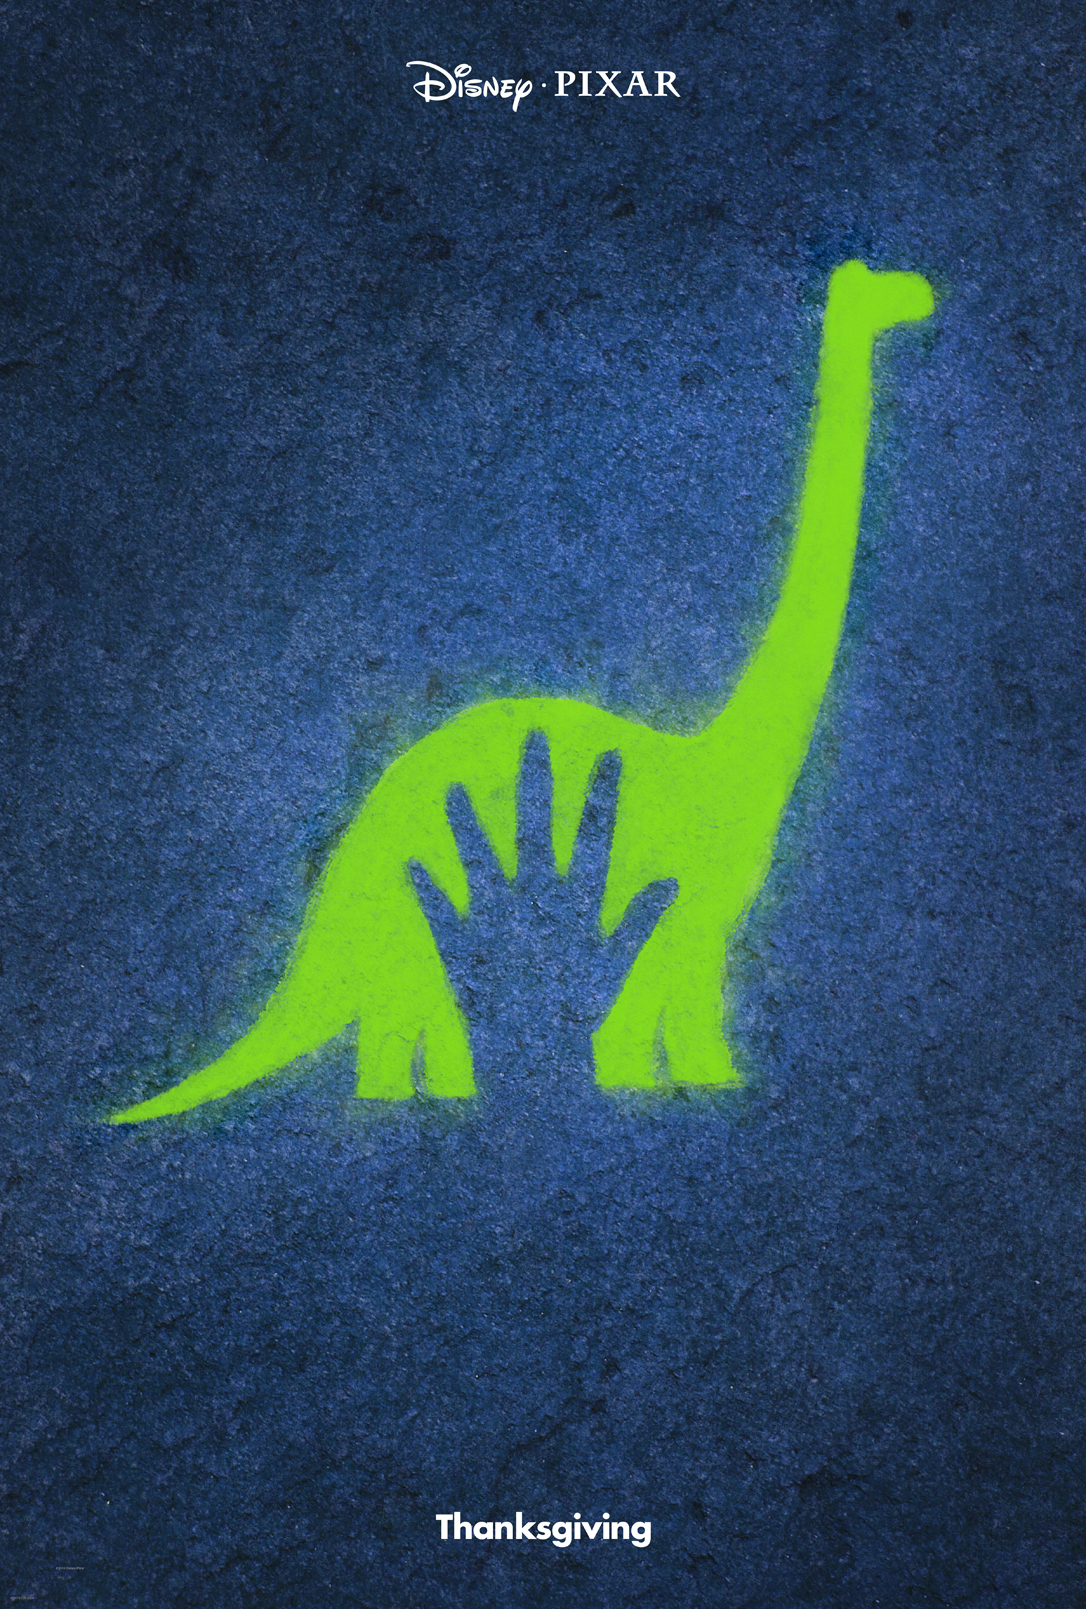 New Movie: The Good Dinosaur